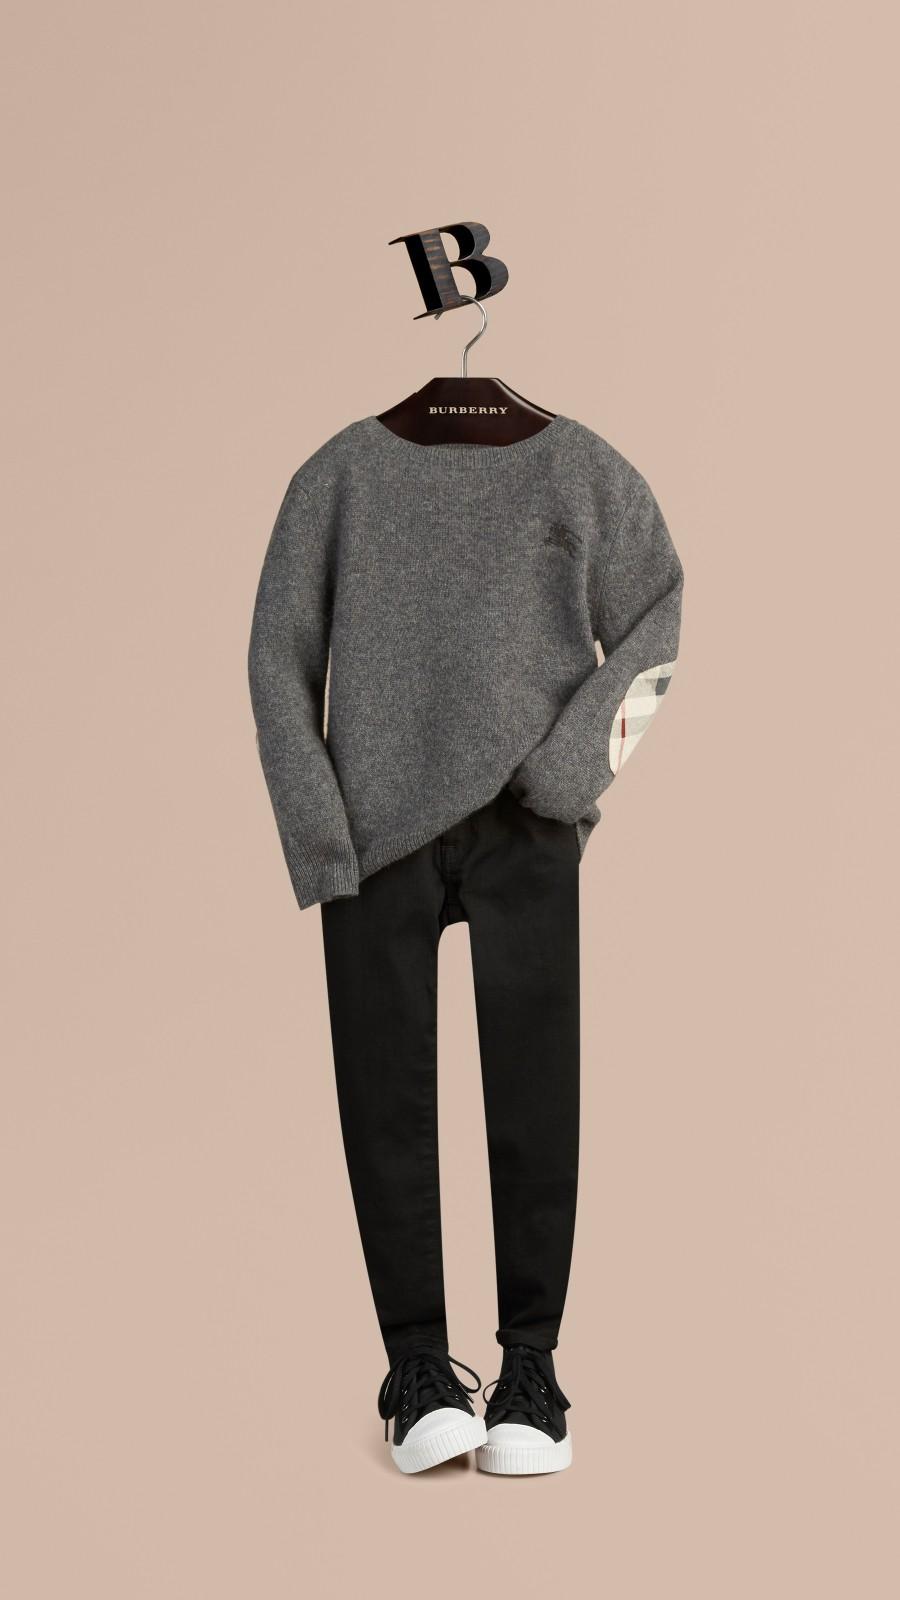 Mid grey melange Check Elbow Patch Cashmere Sweater Mid Grey Melange - Image 1